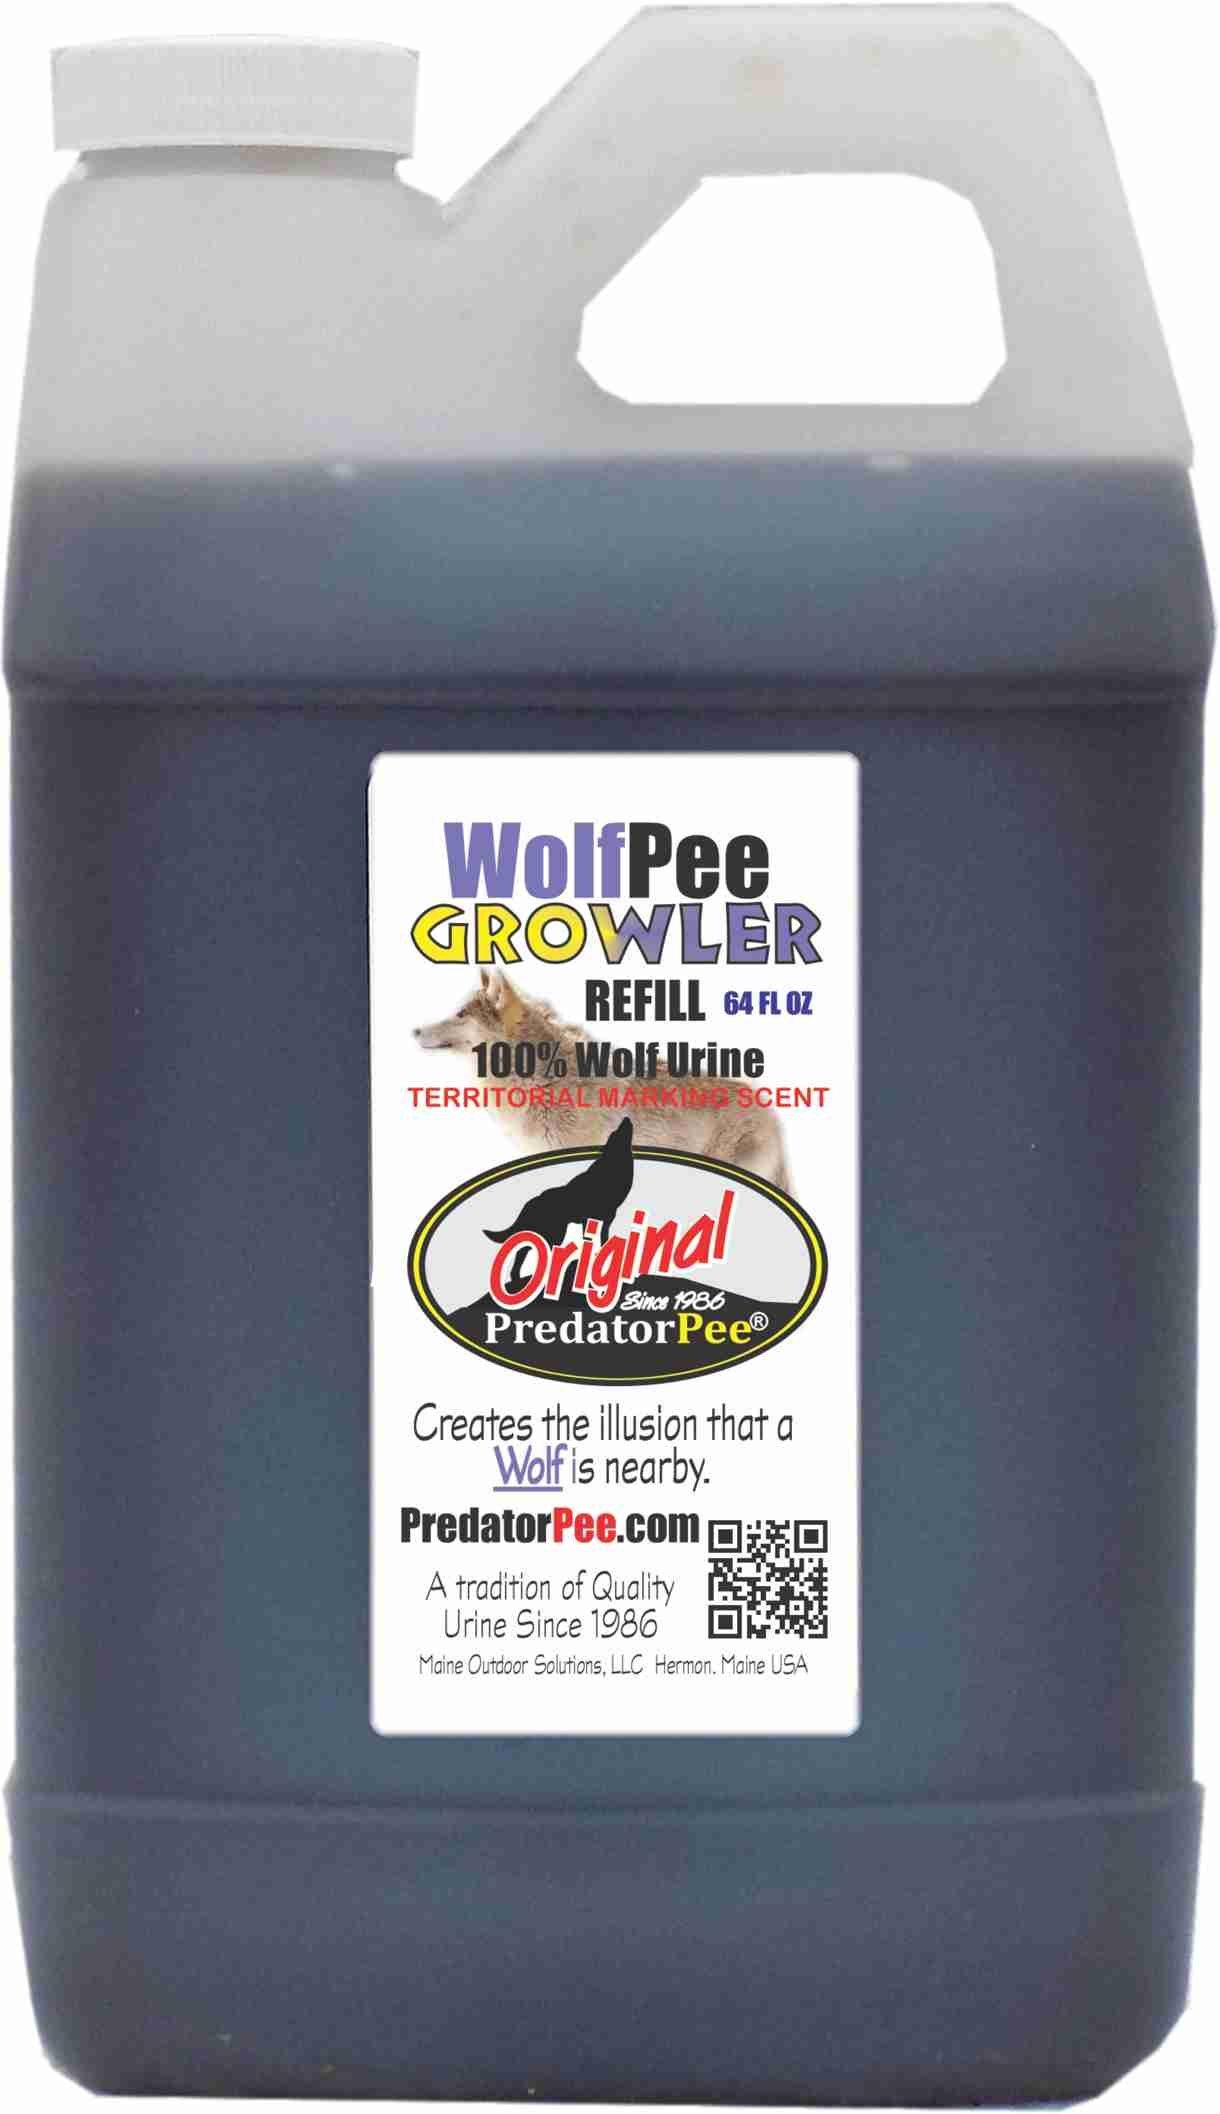 Predator Pee – 100% Pure Wolf Urine – 64oz Refill Jug